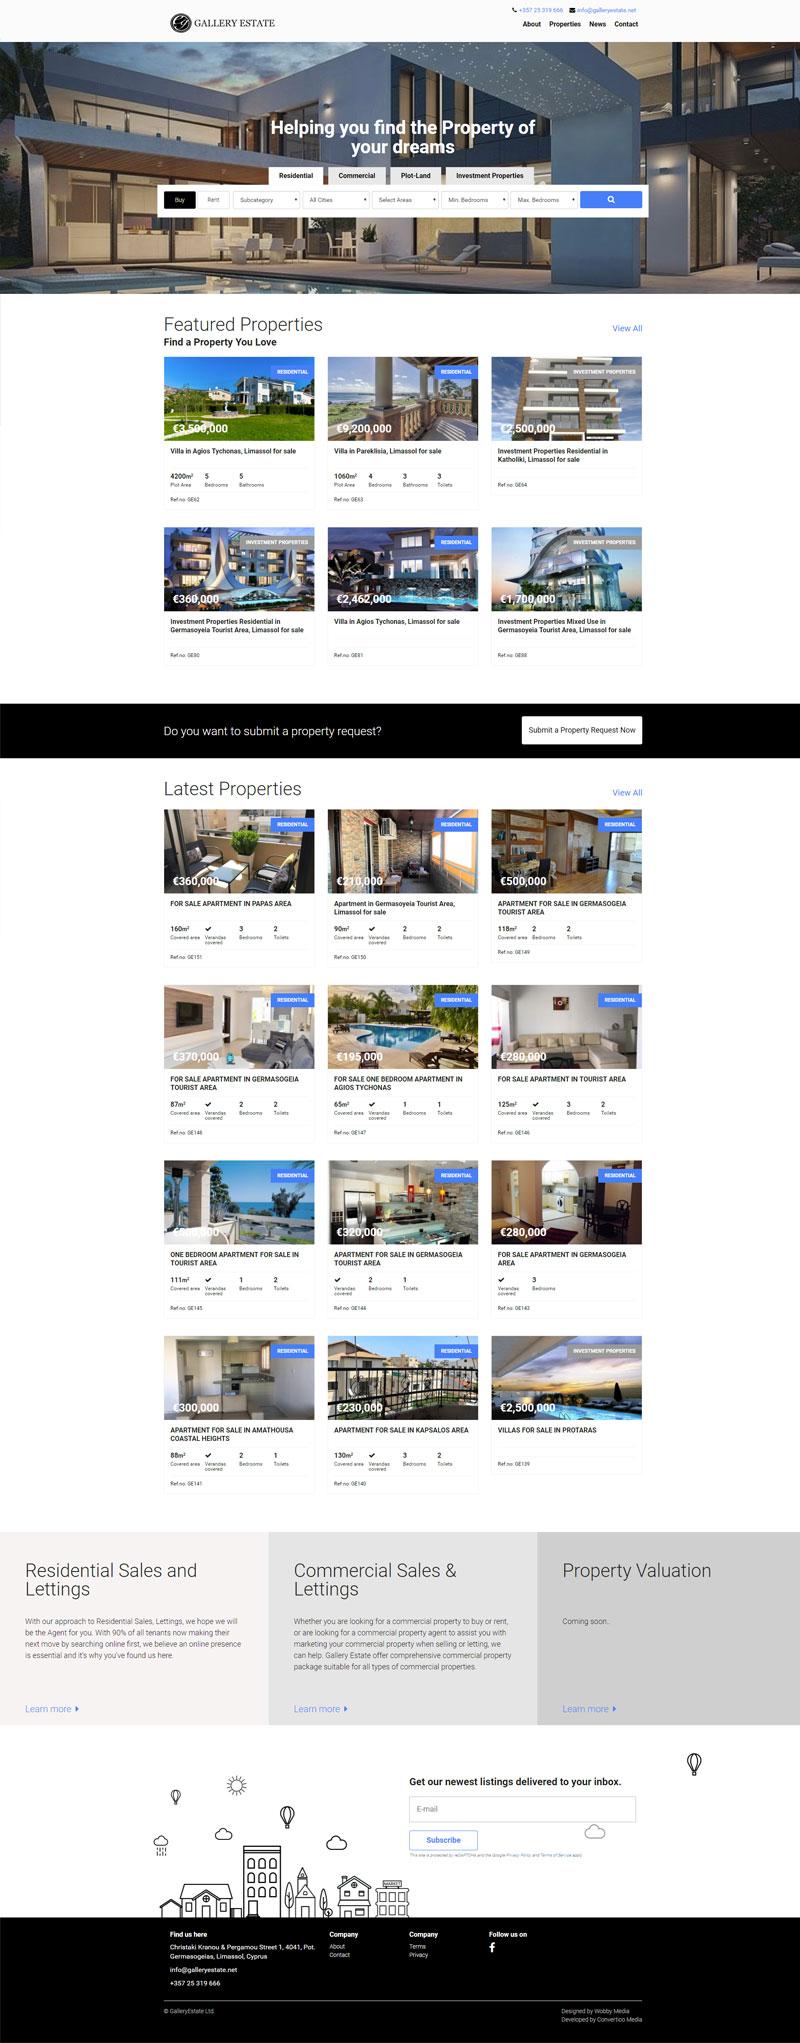 gallery-estate-homepage